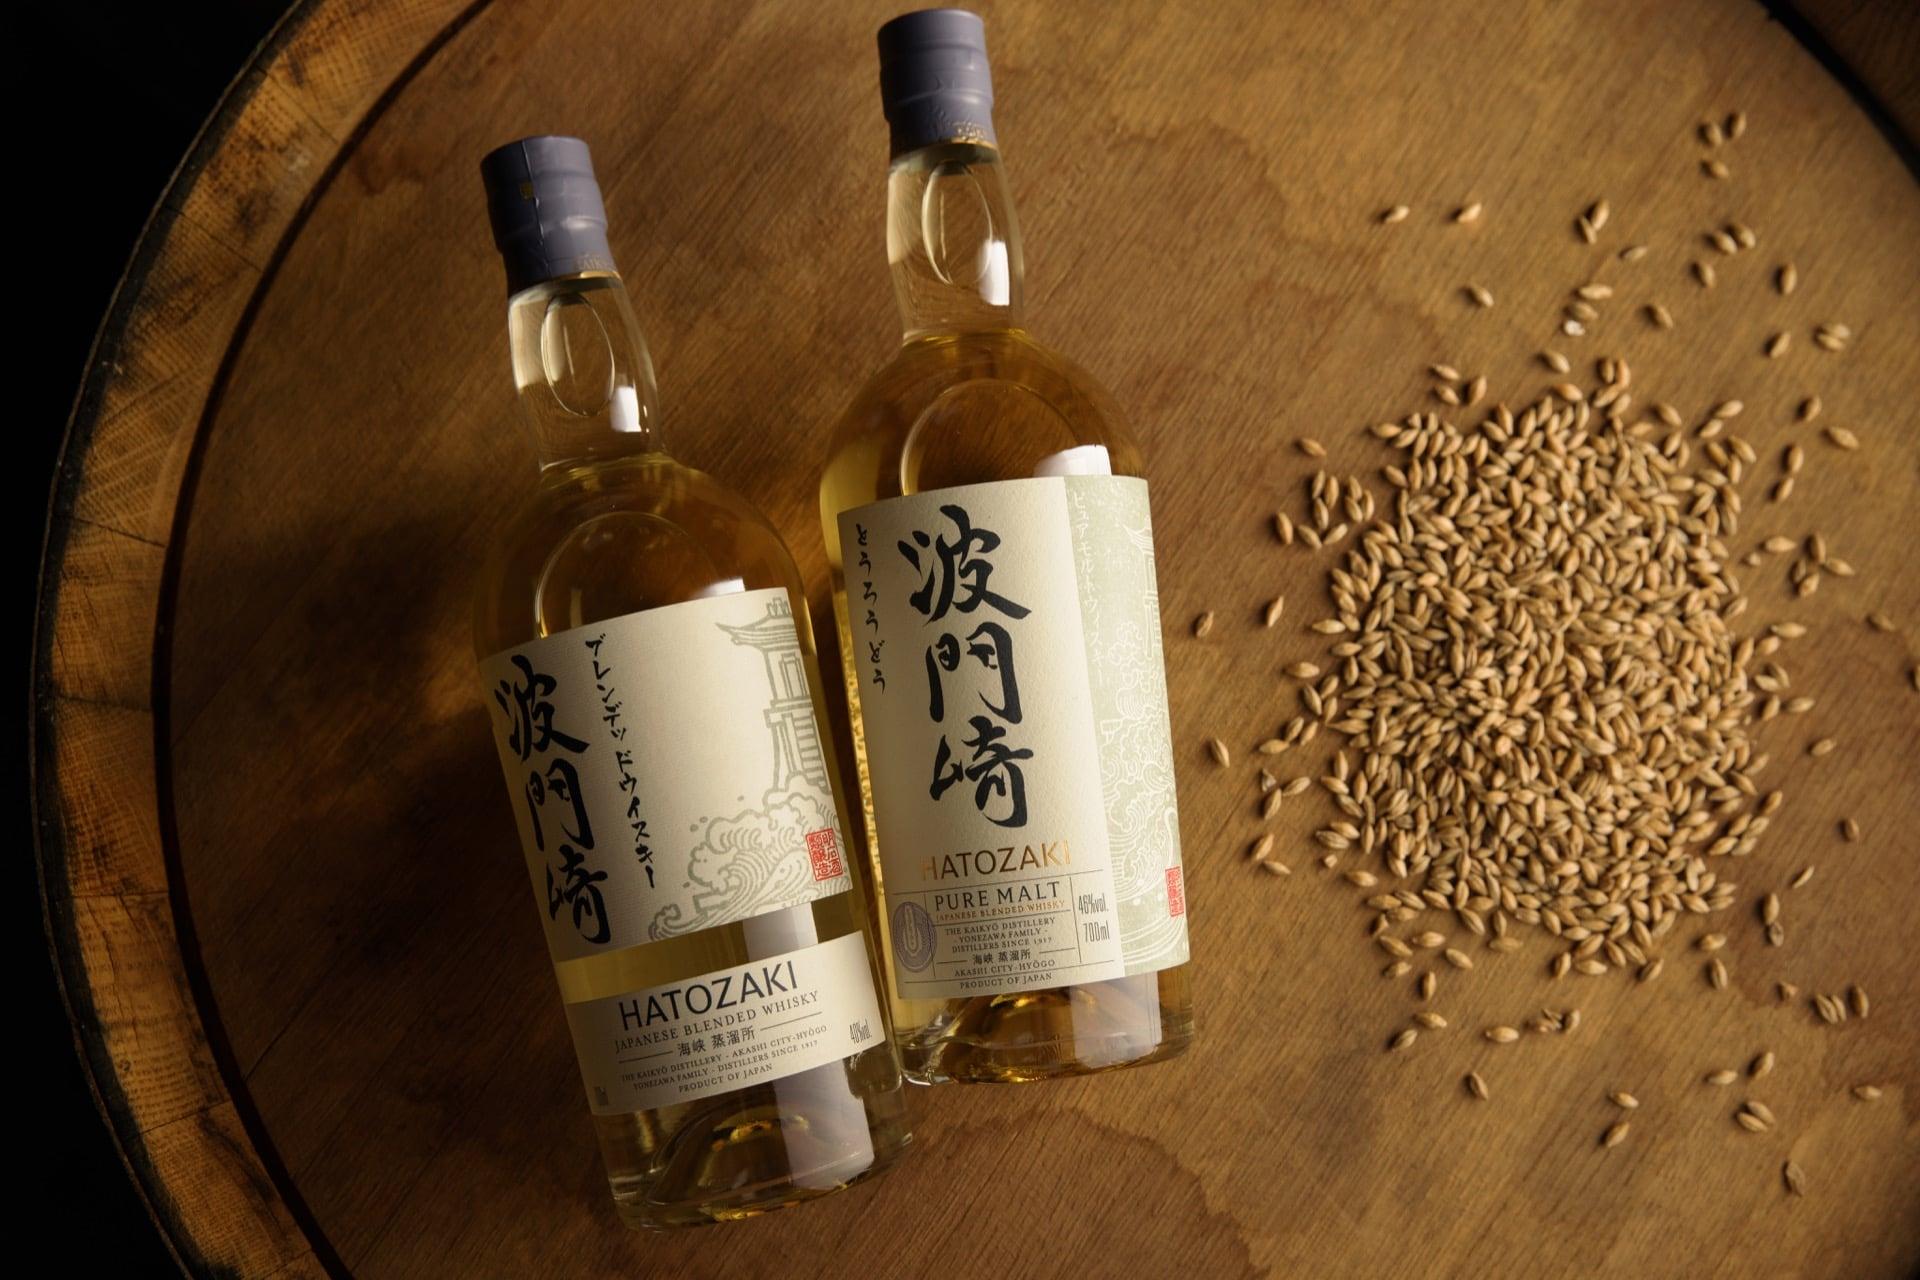 Hatozaki | Kaikyō Distillery | Japanese Whisky Brand